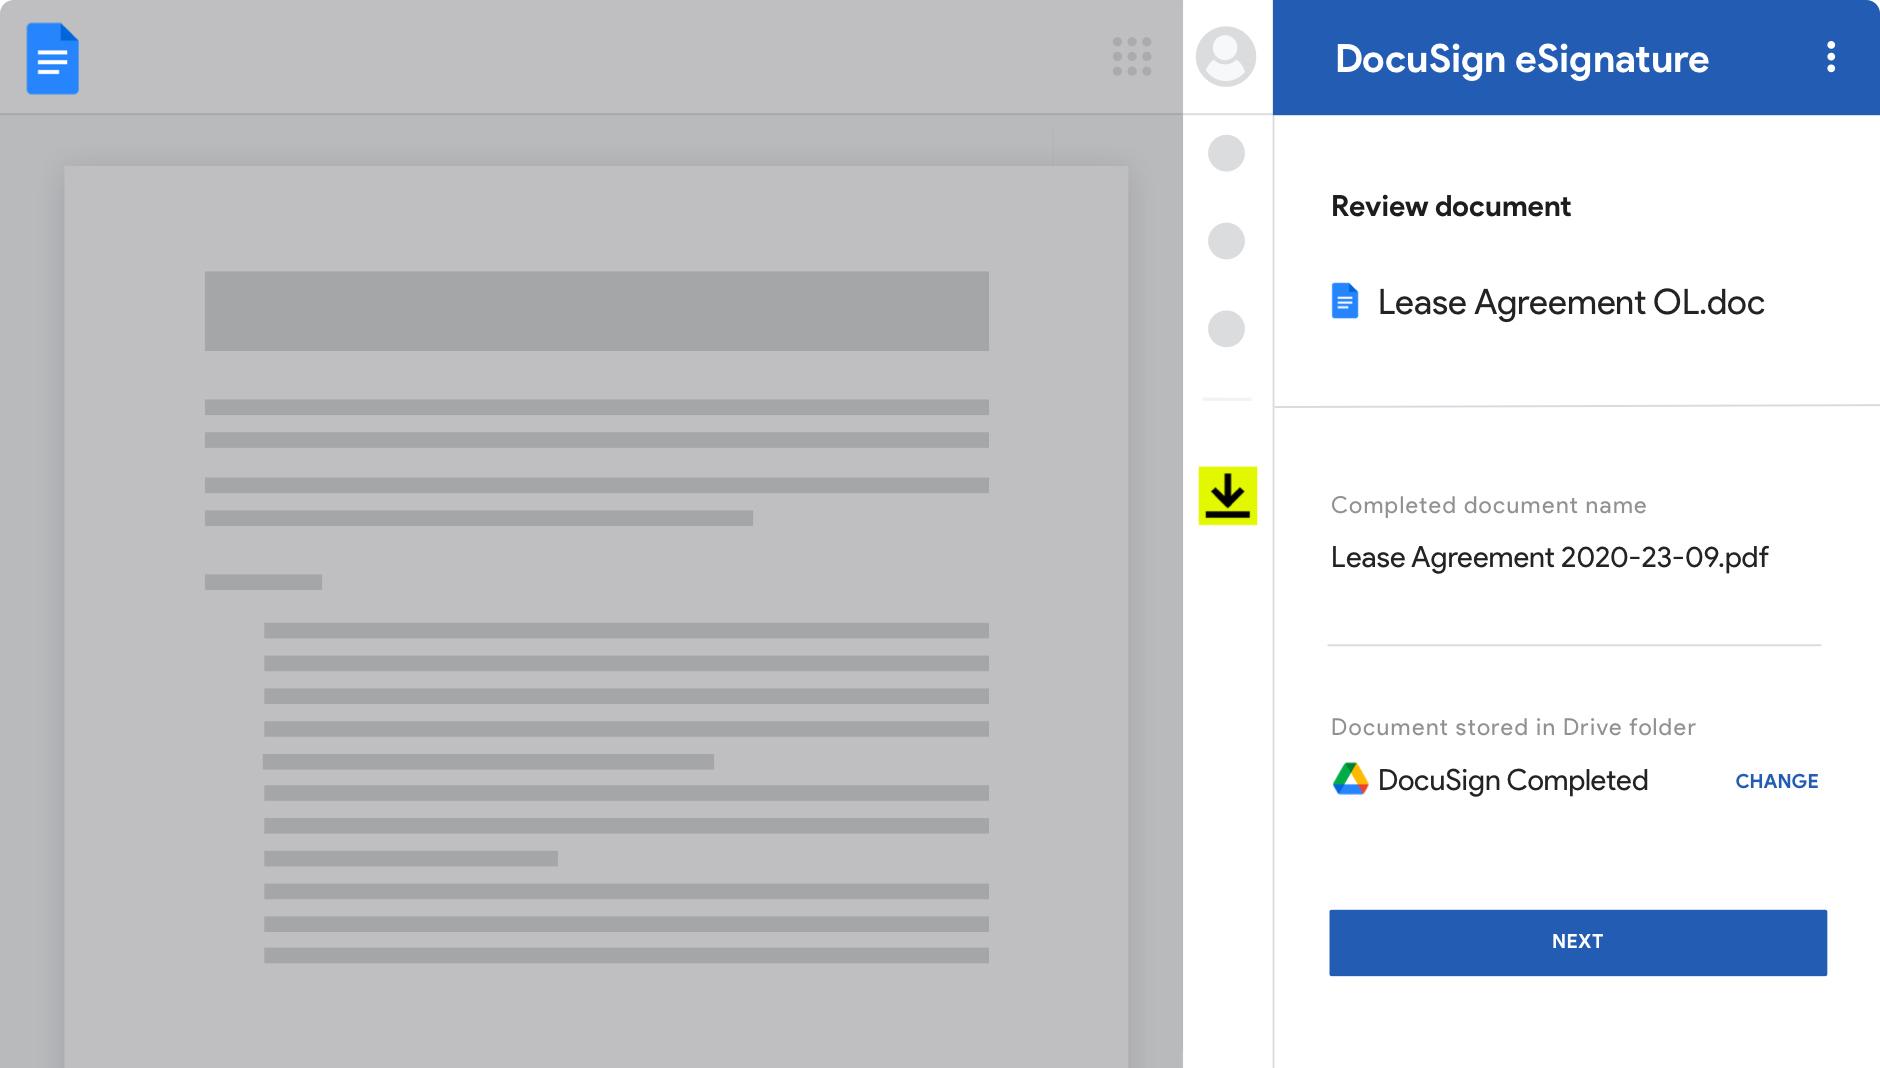 Google Docs avec DocuSign eSignature montrant des accords et leur statut.